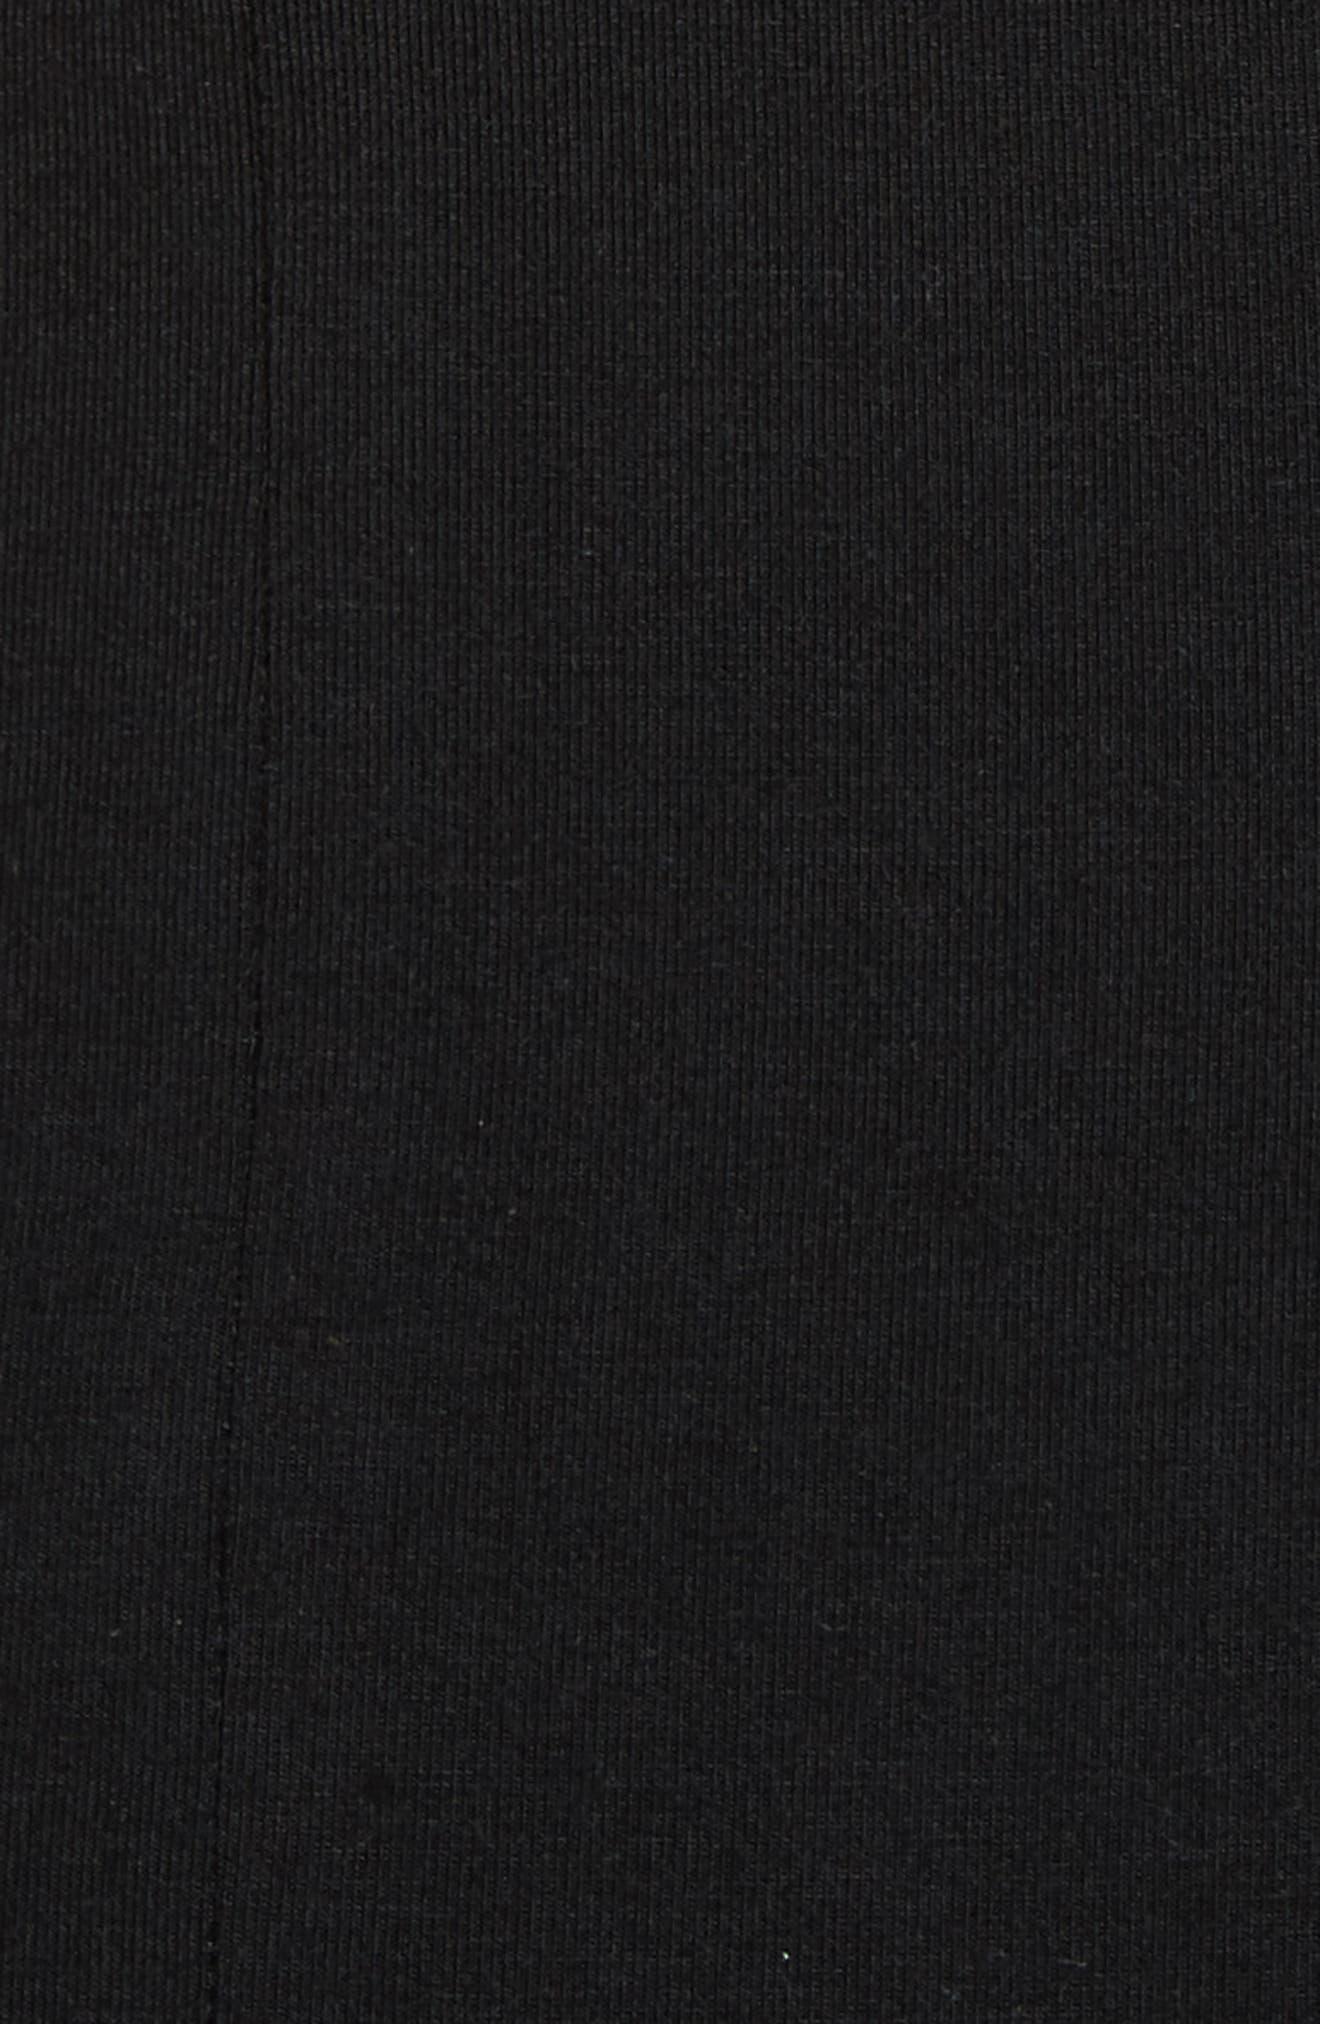 Lace-Up Stretch Jersey Midi Dress,                             Alternate thumbnail 5, color,                             001